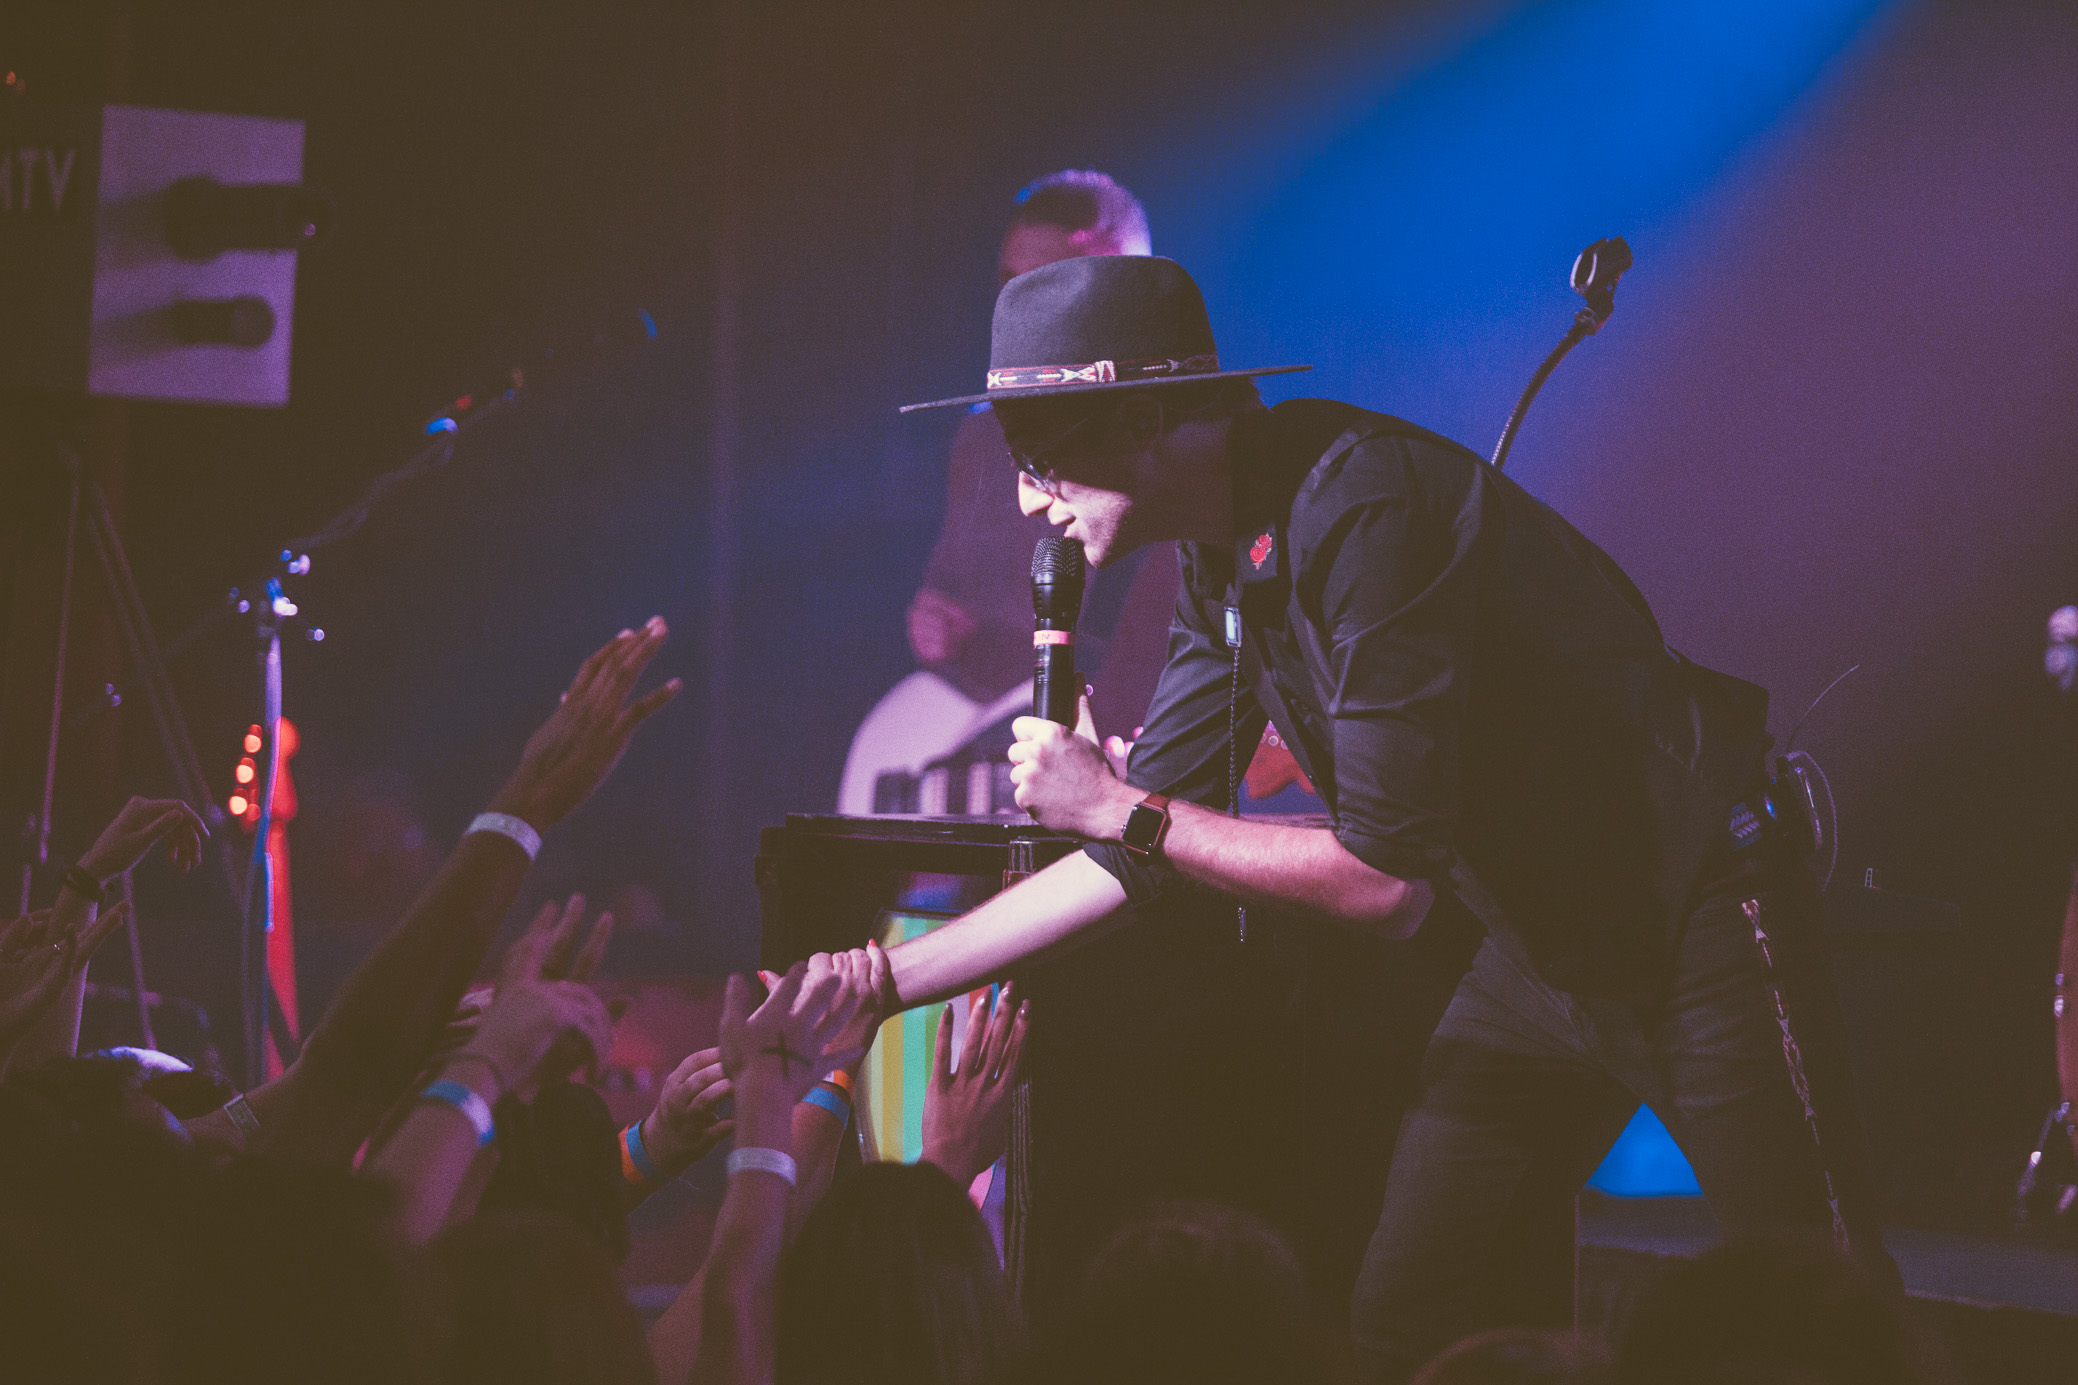 A/J Jackson of Saint Motel performs in concert at Saturn Birmingham in Birmingham, Alabama on November 7th, 2017. (Photo by David A. Smith/DSmithScenes)